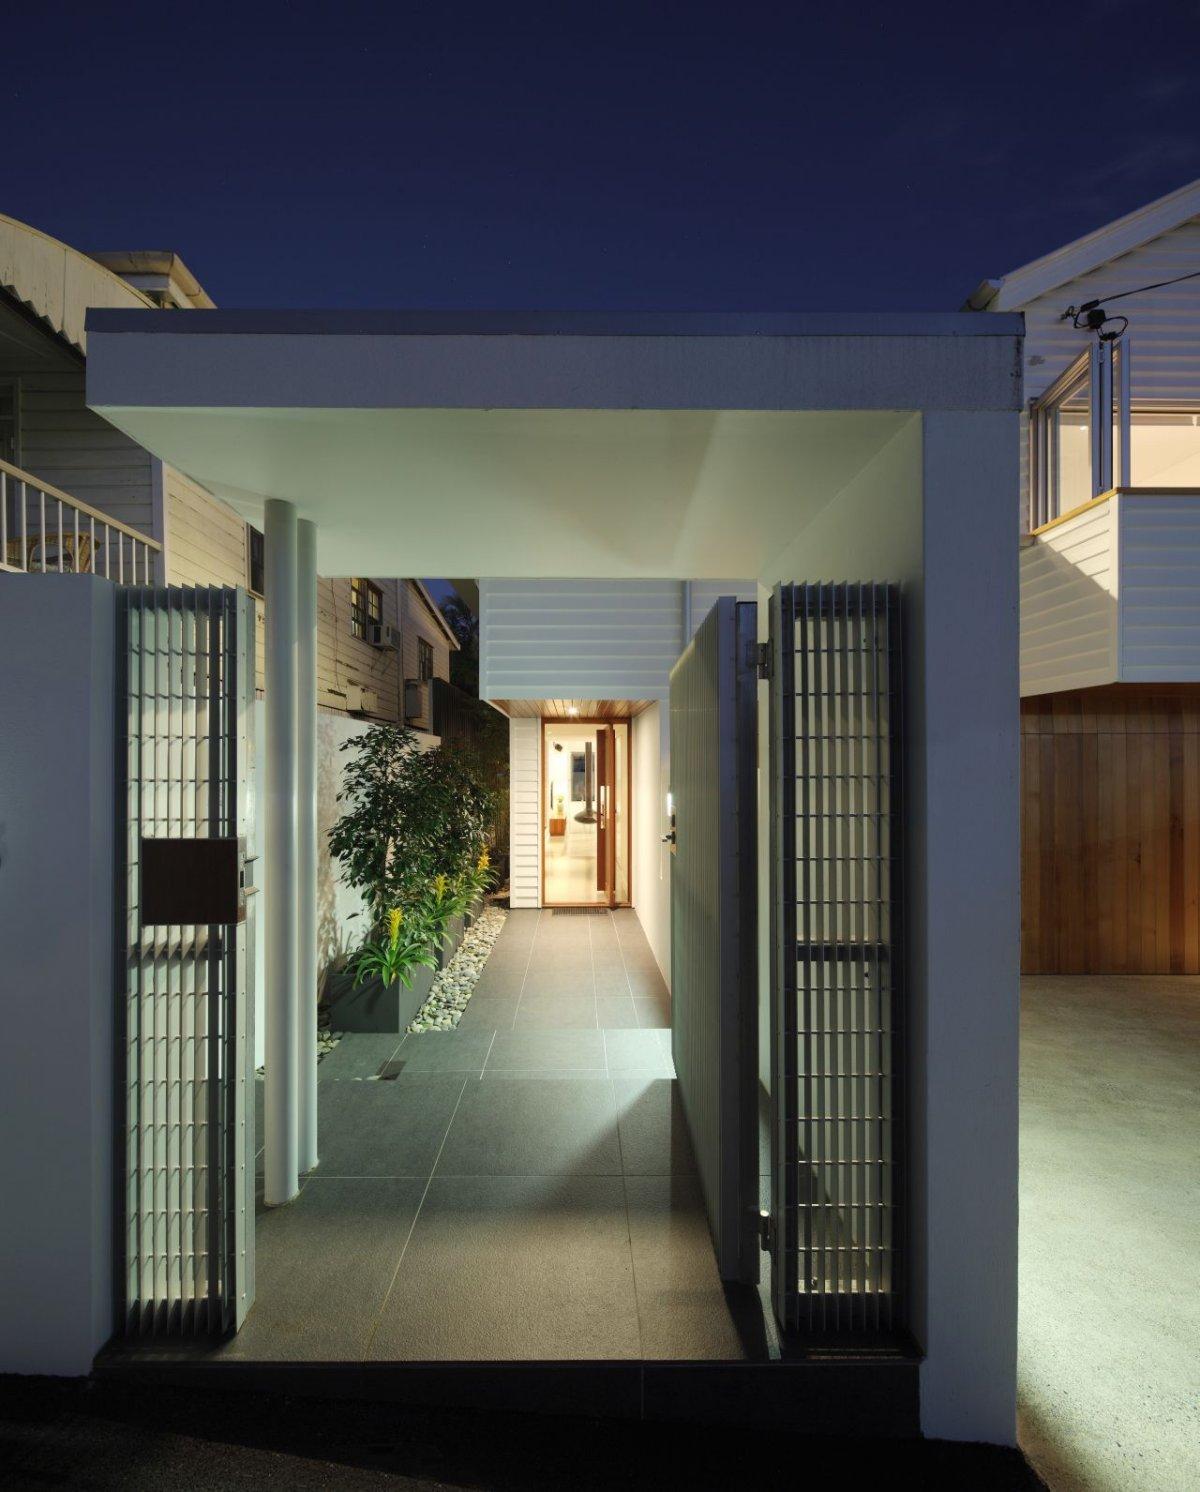 Entrance, Contemporary Family Home in Queensland, Australia